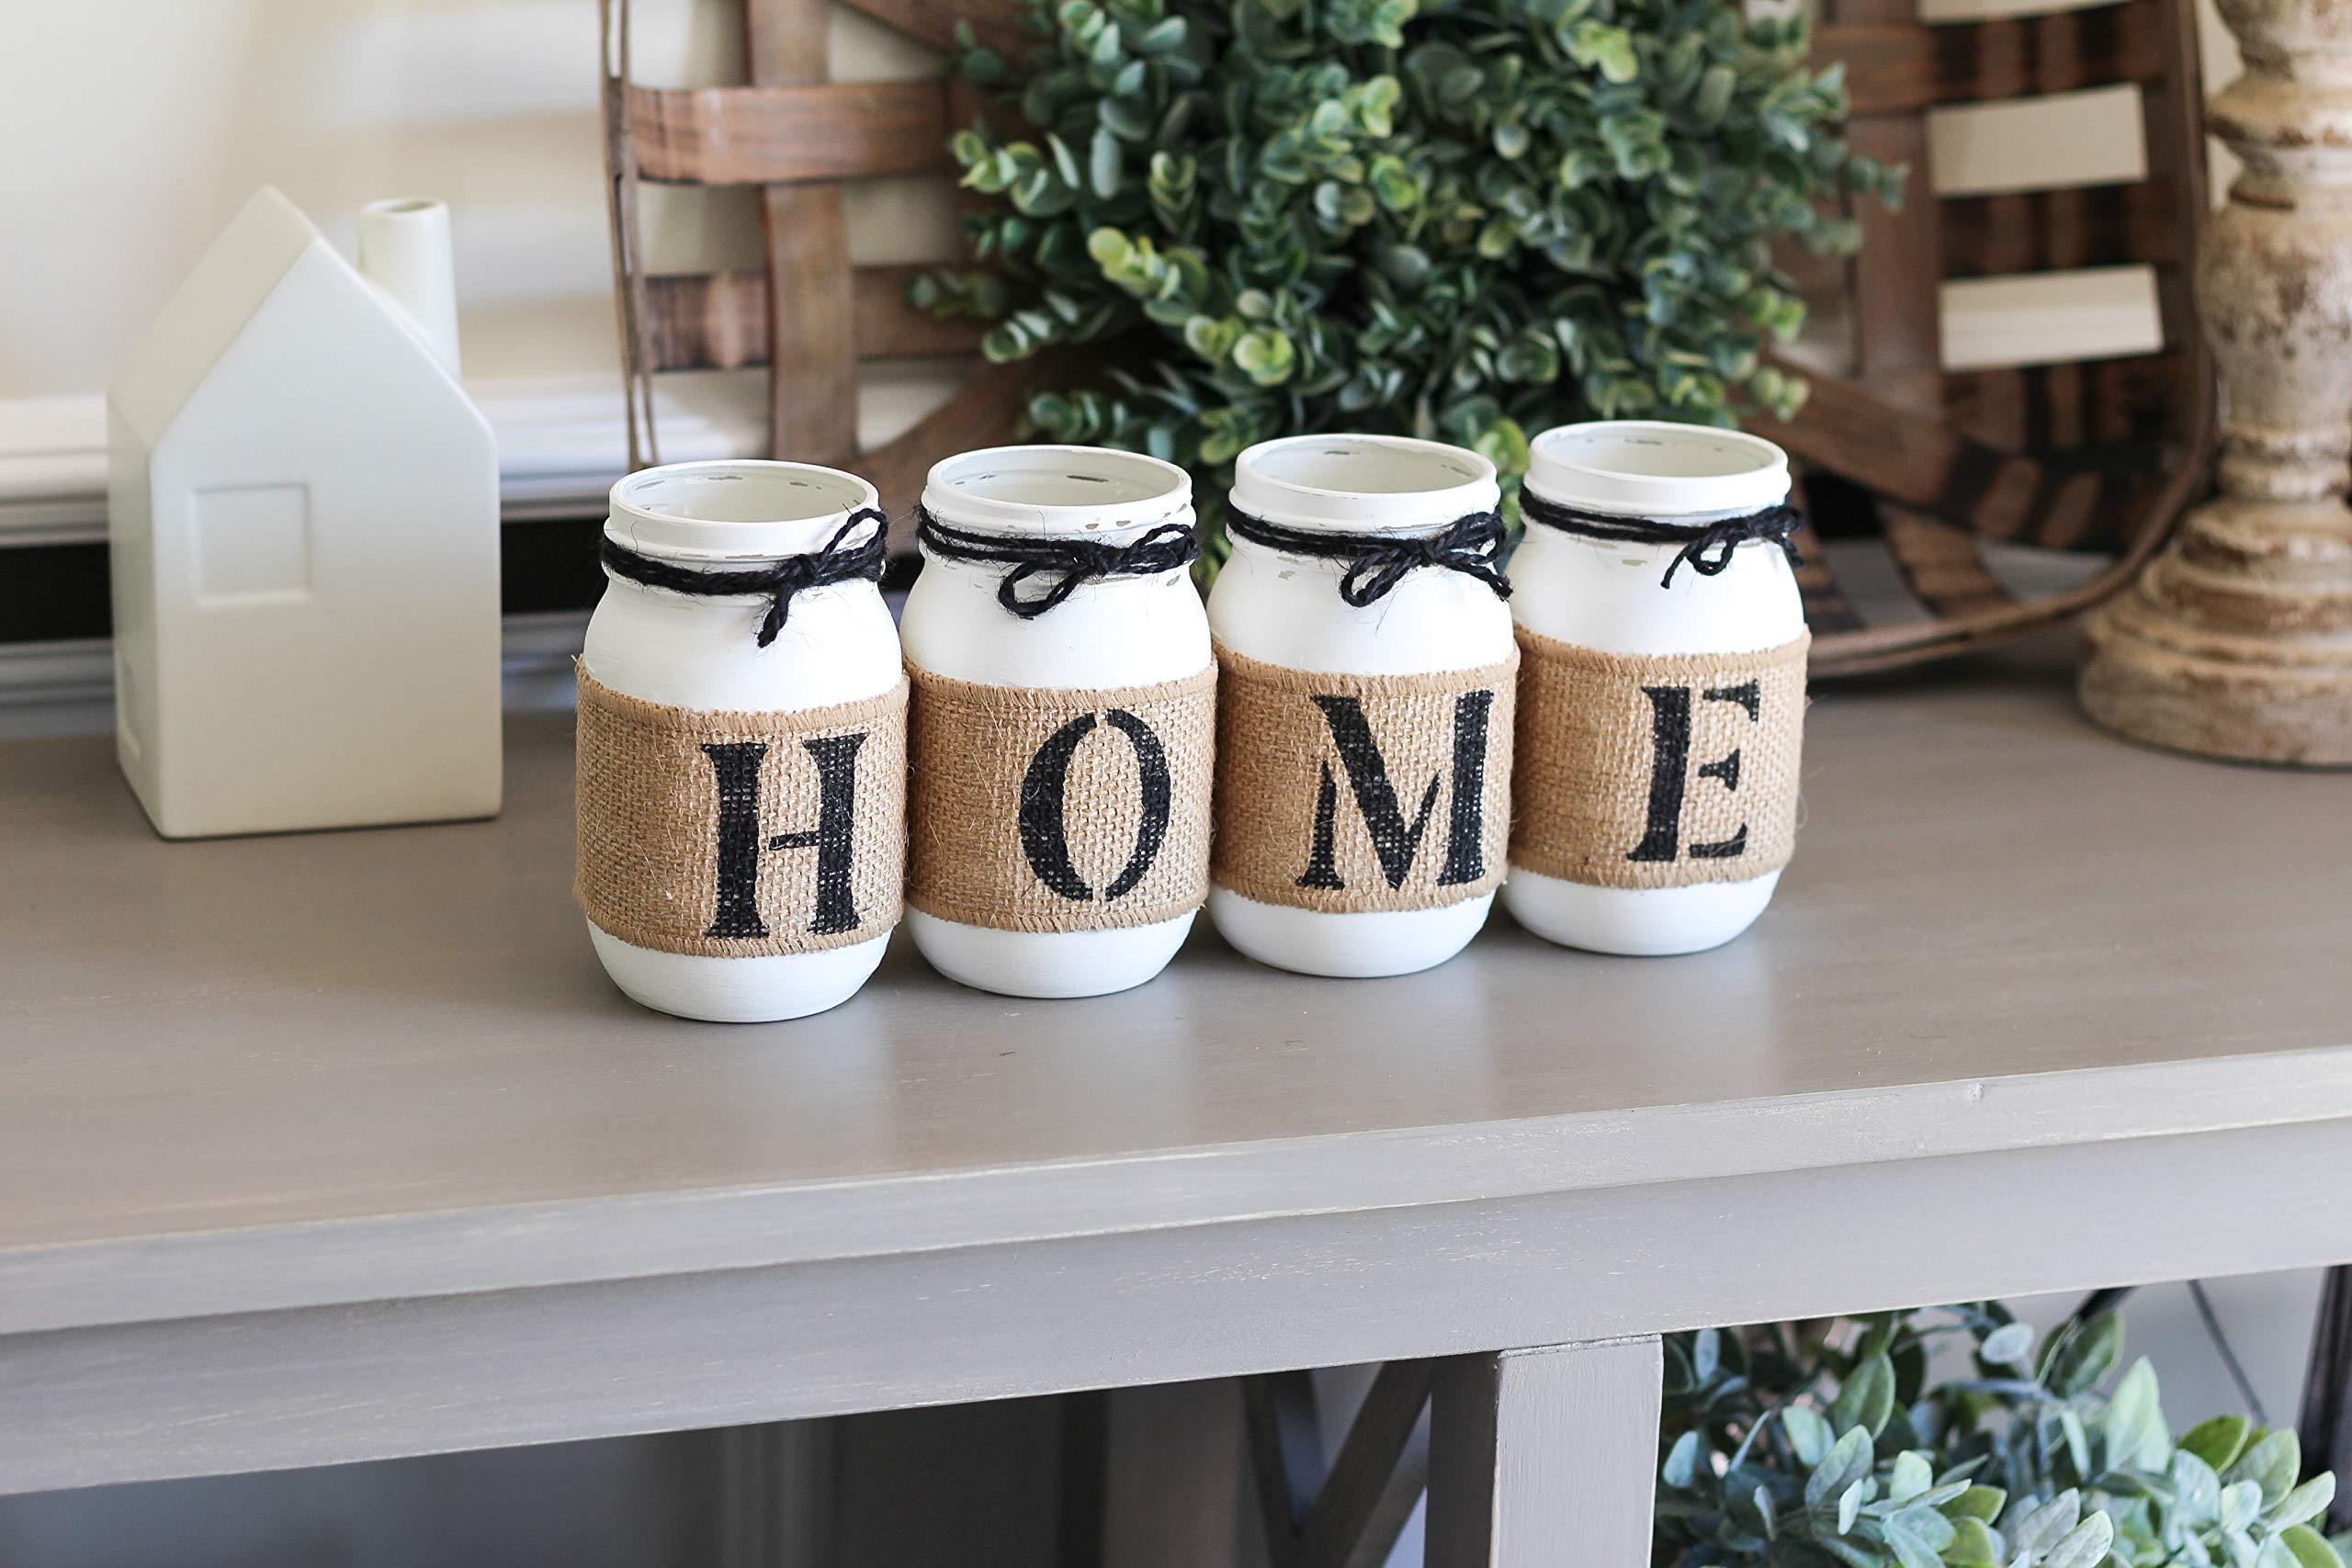 Farmhouse Table Decor - Housewarming Gift - Two Sided Home Mason Jars Set by Jarful House